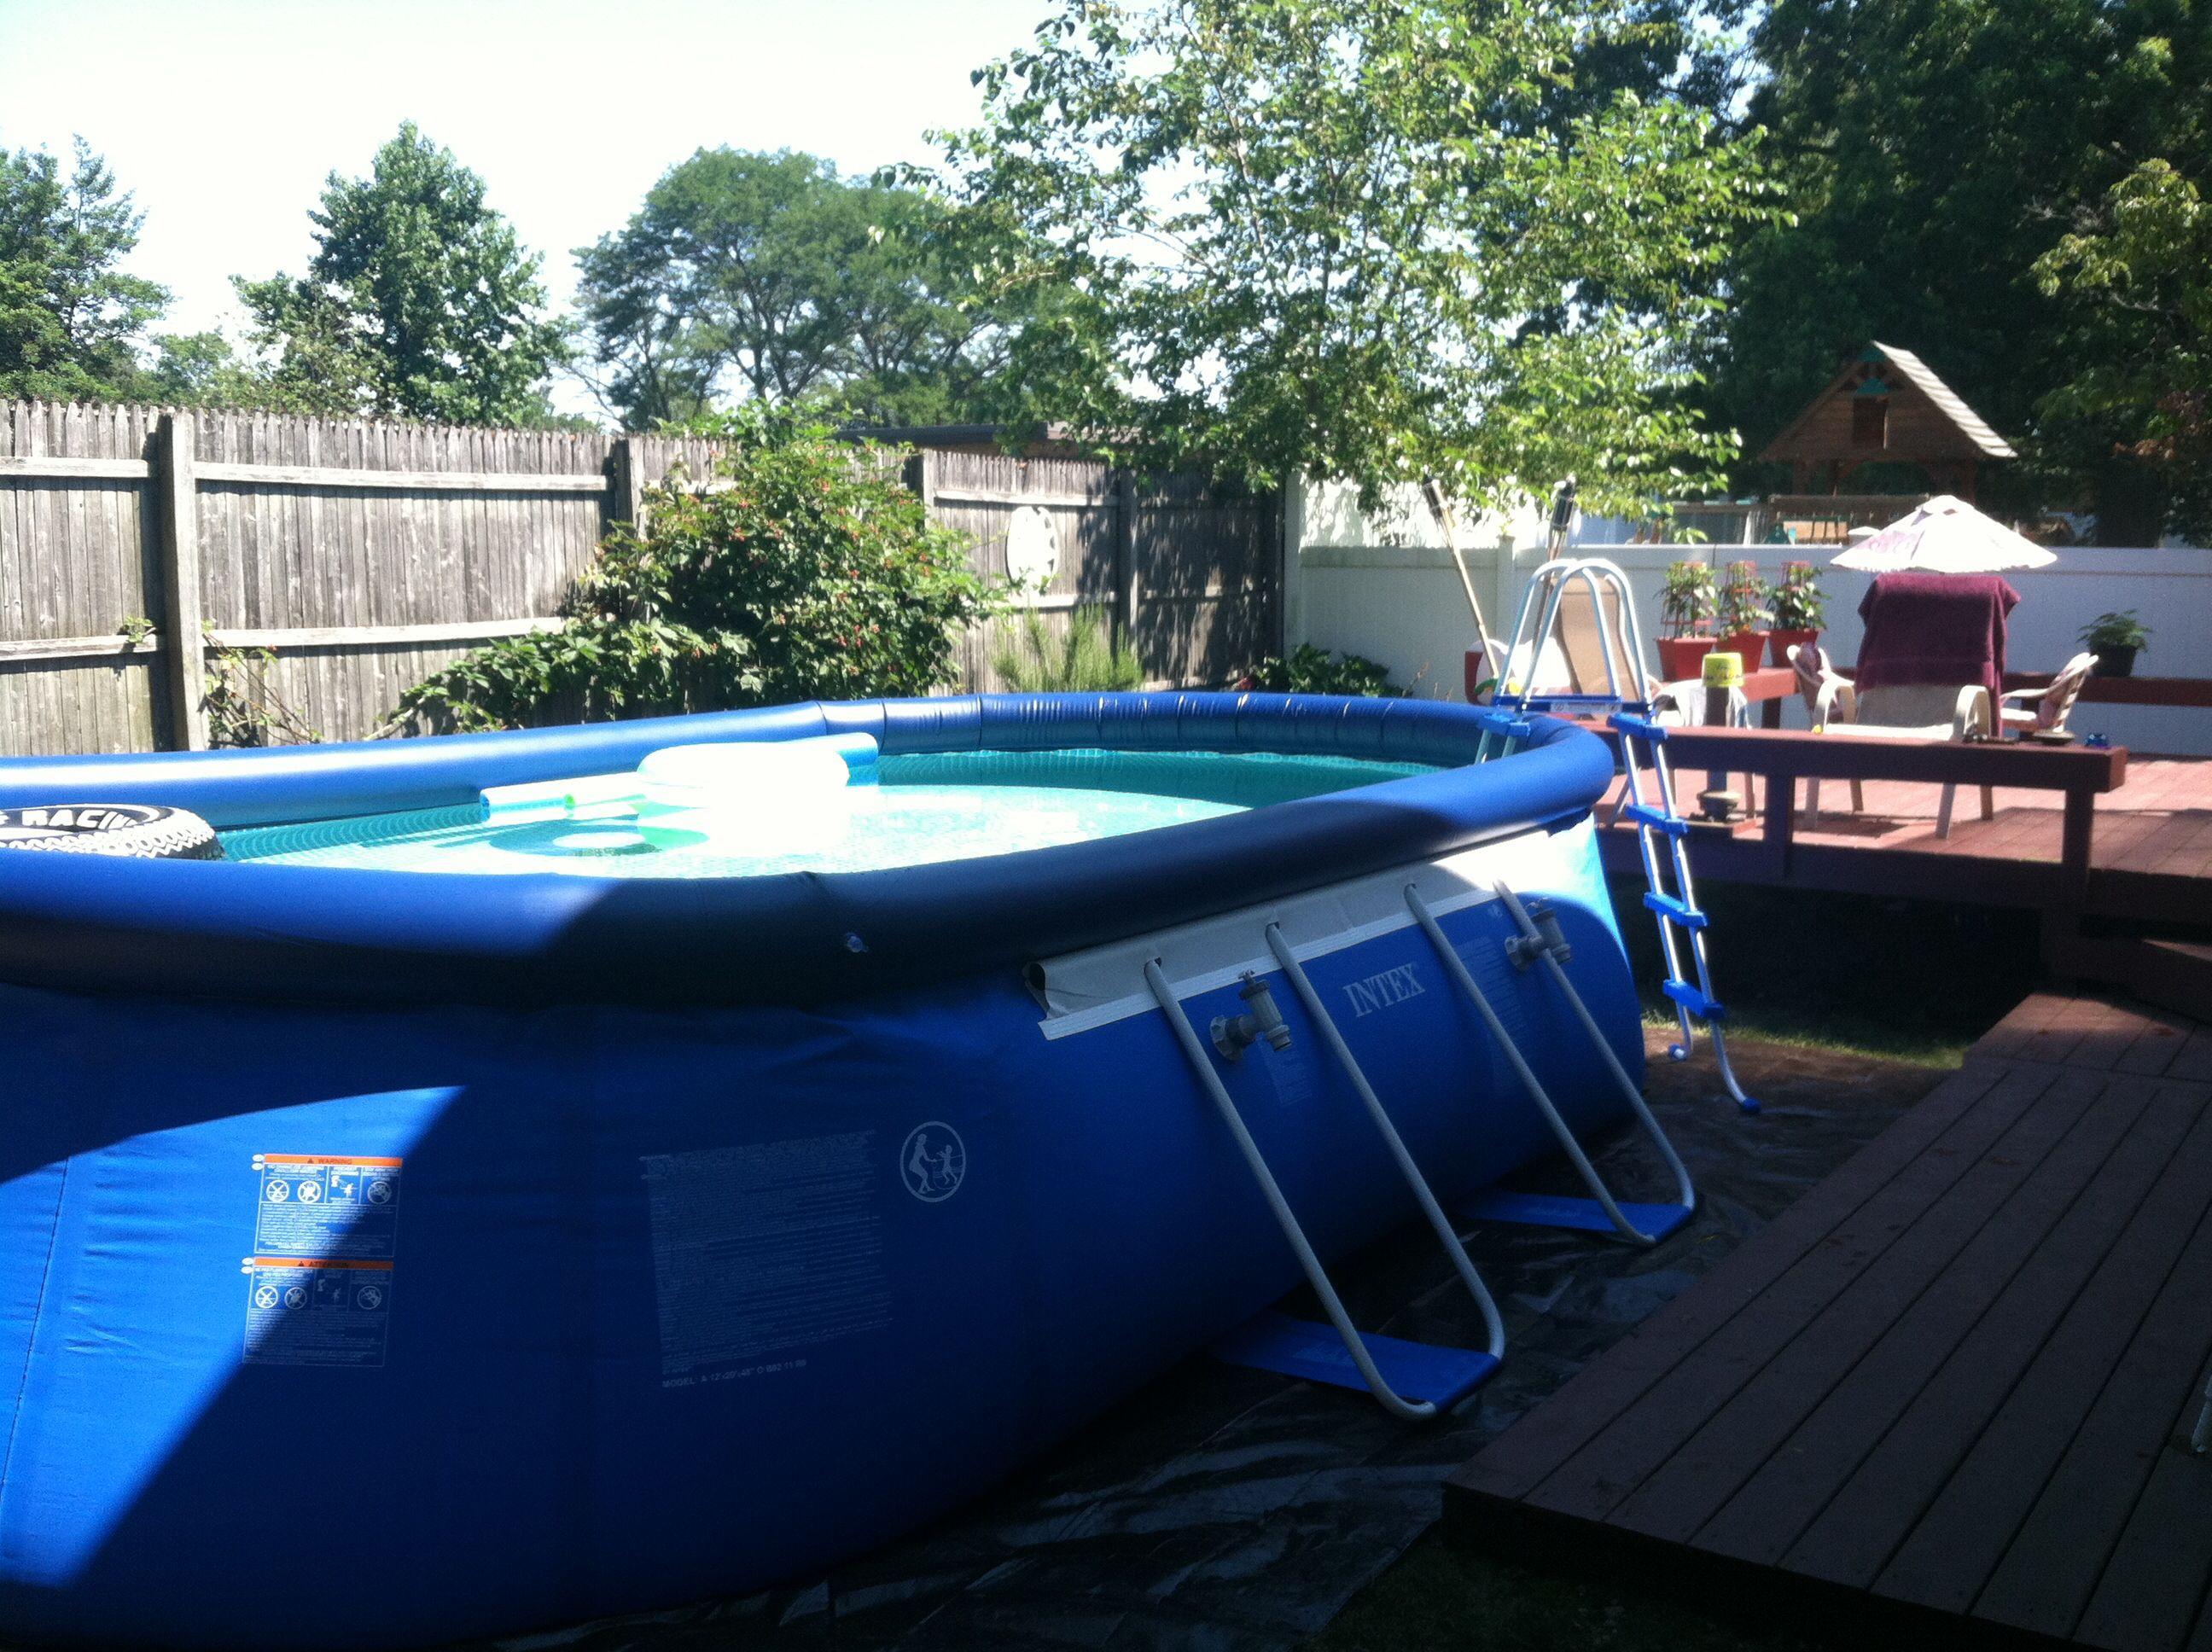 best pool ever easy set up swim all summer long intex intexpool my intex pool pinterest. Black Bedroom Furniture Sets. Home Design Ideas